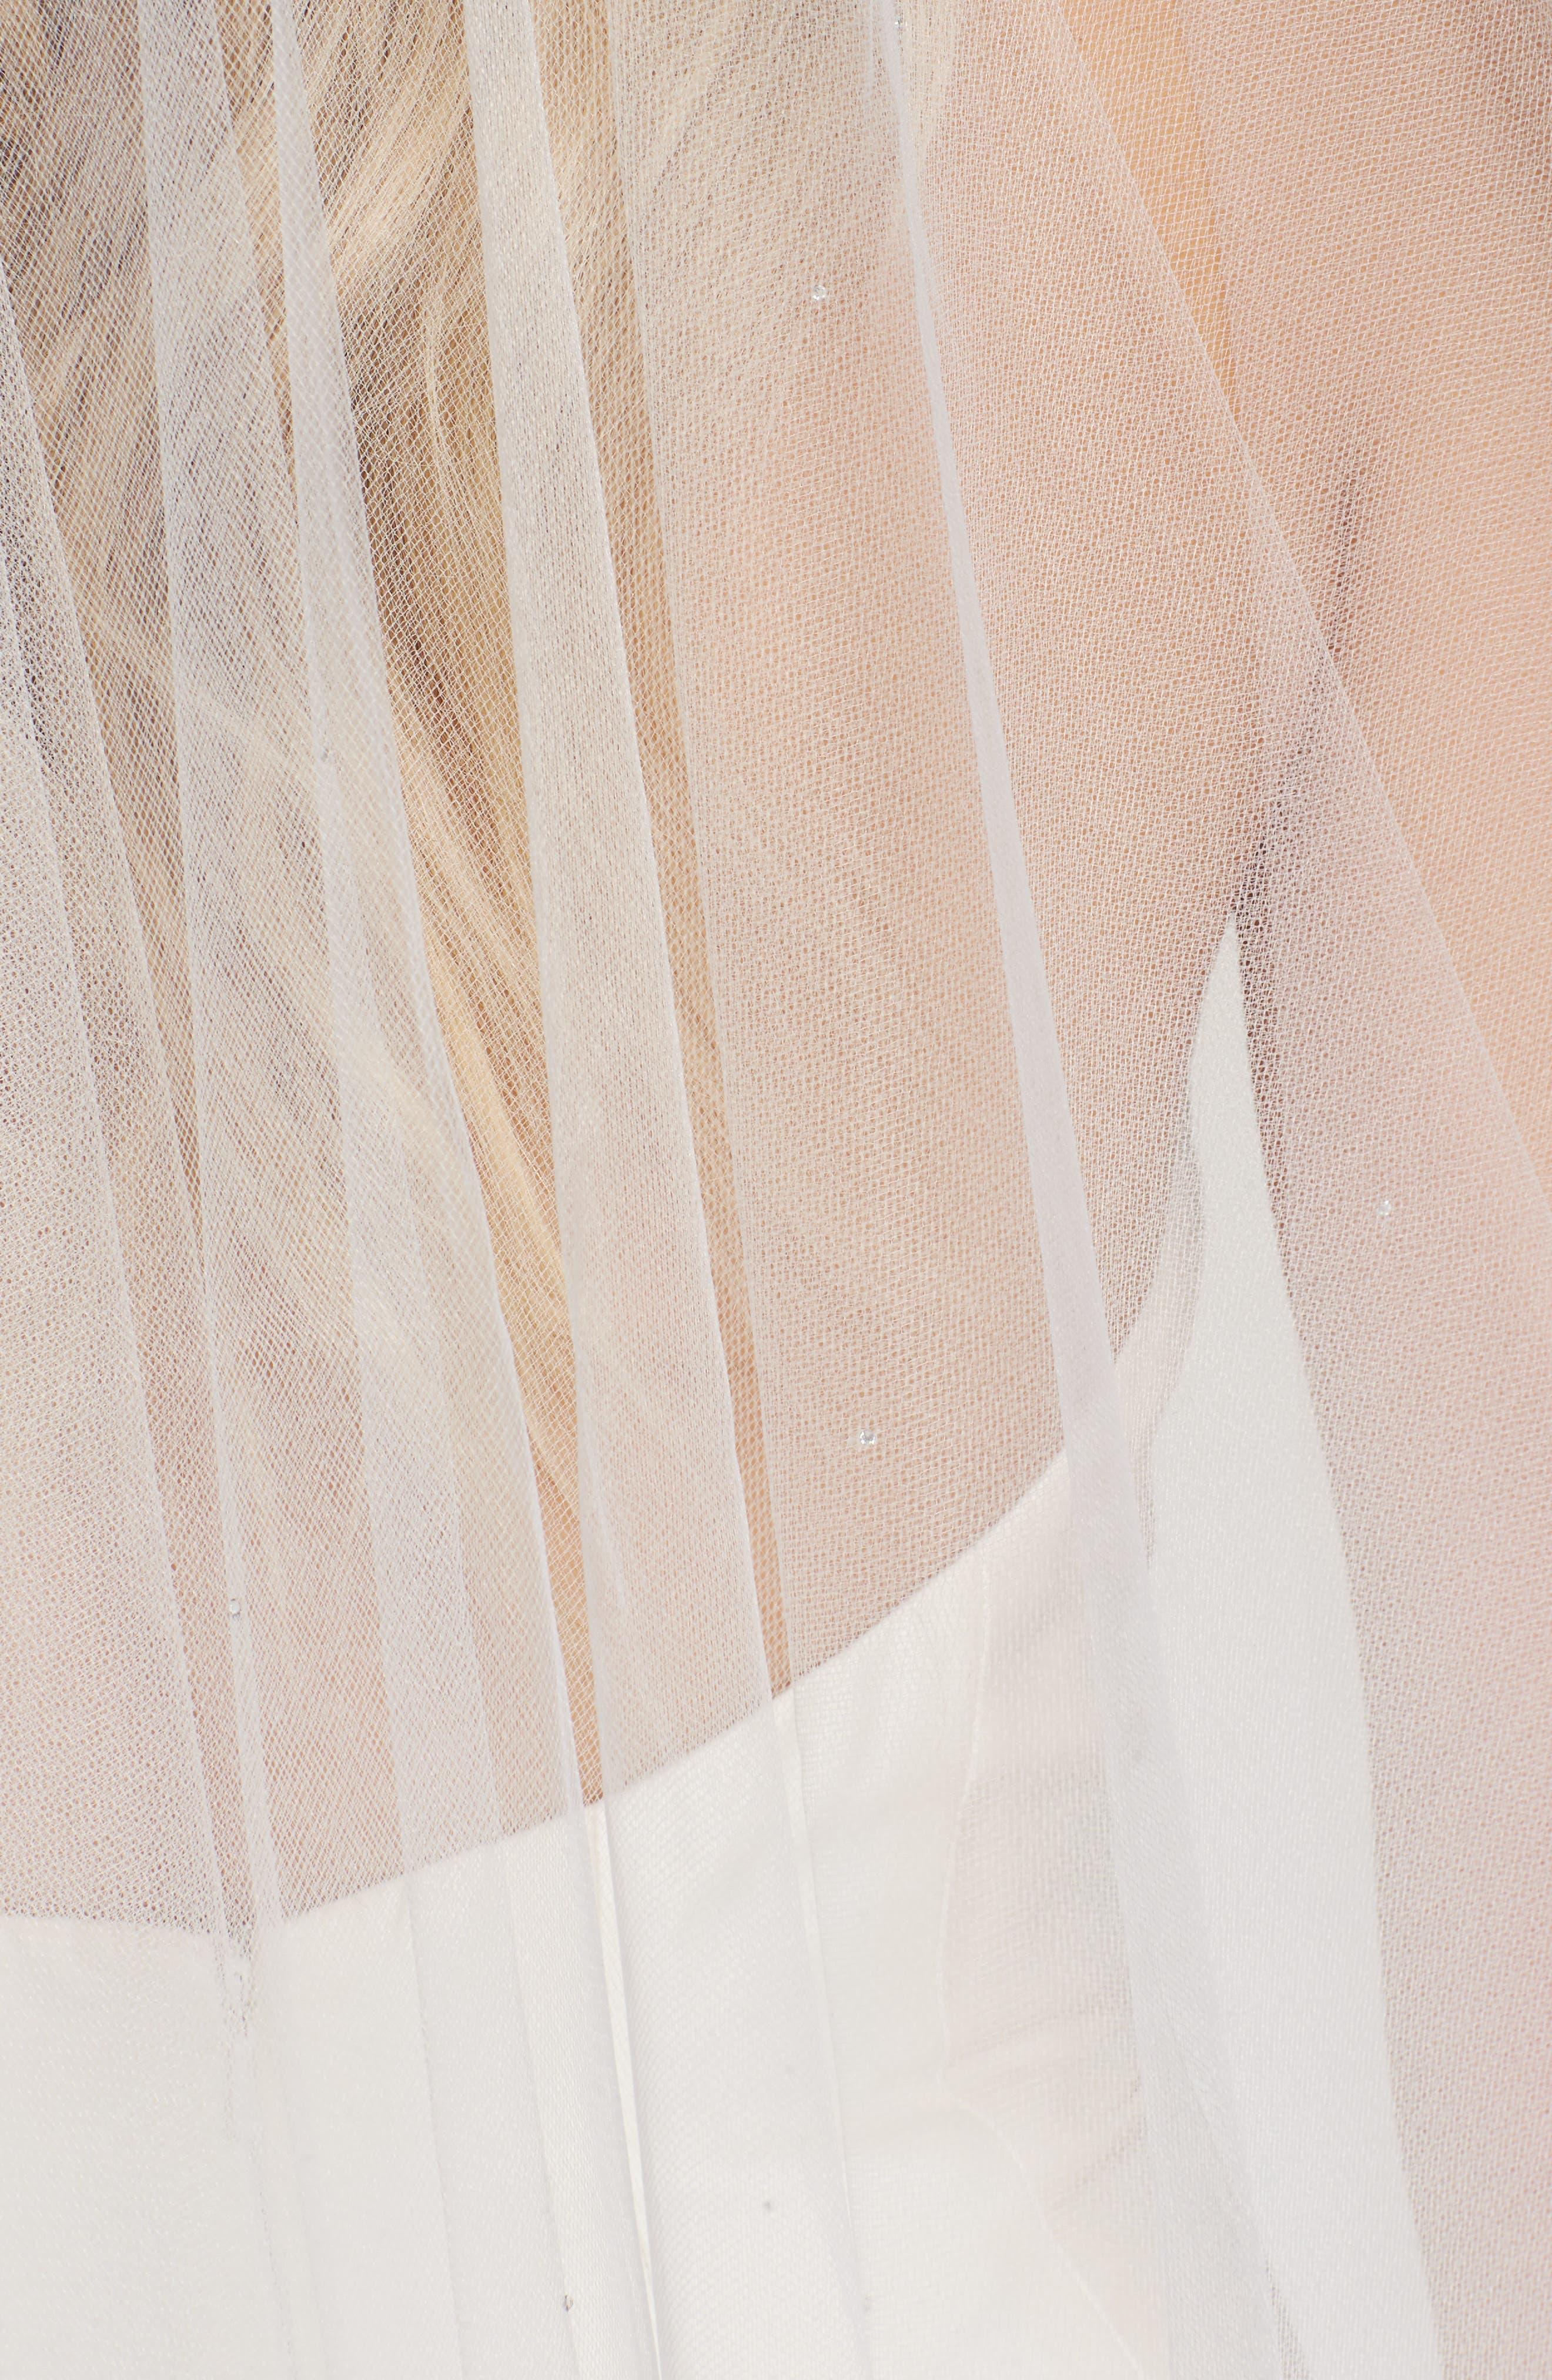 Alternate Image 2  - Wedding Belles New York 'Madeline - Crystal' Two Tier Veil (Nordstrom Exclusive)